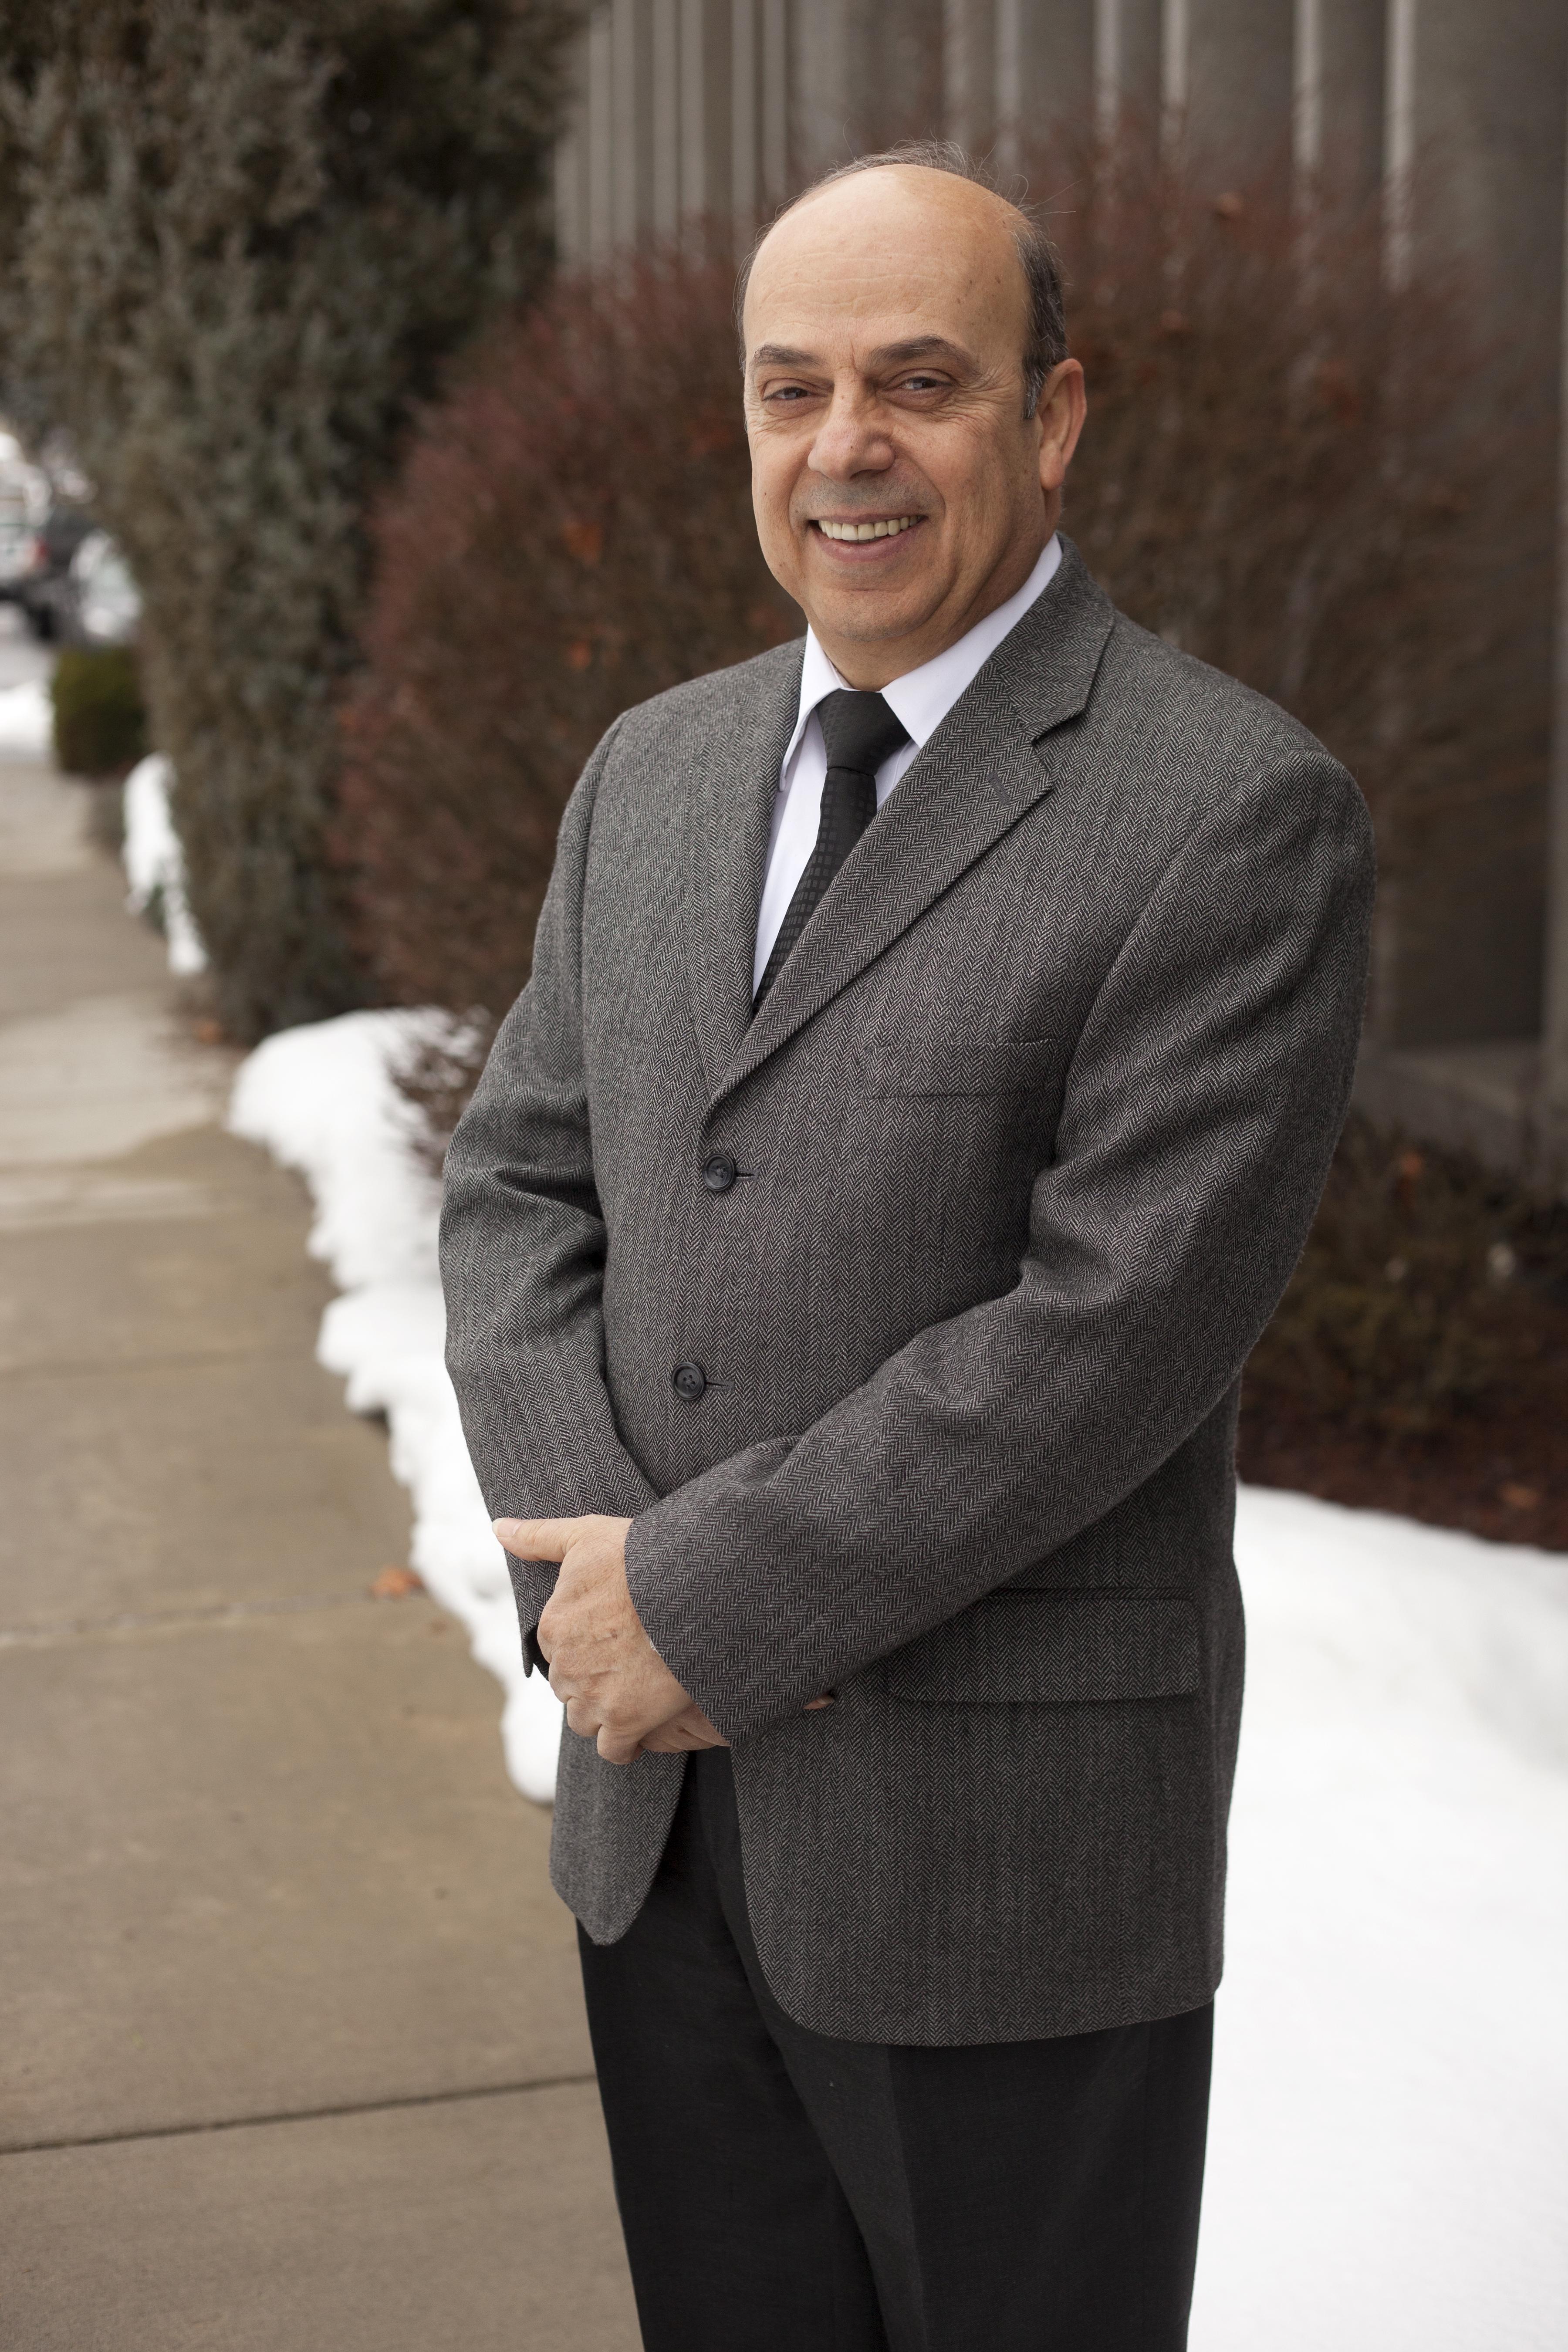 Ghassan Nemri